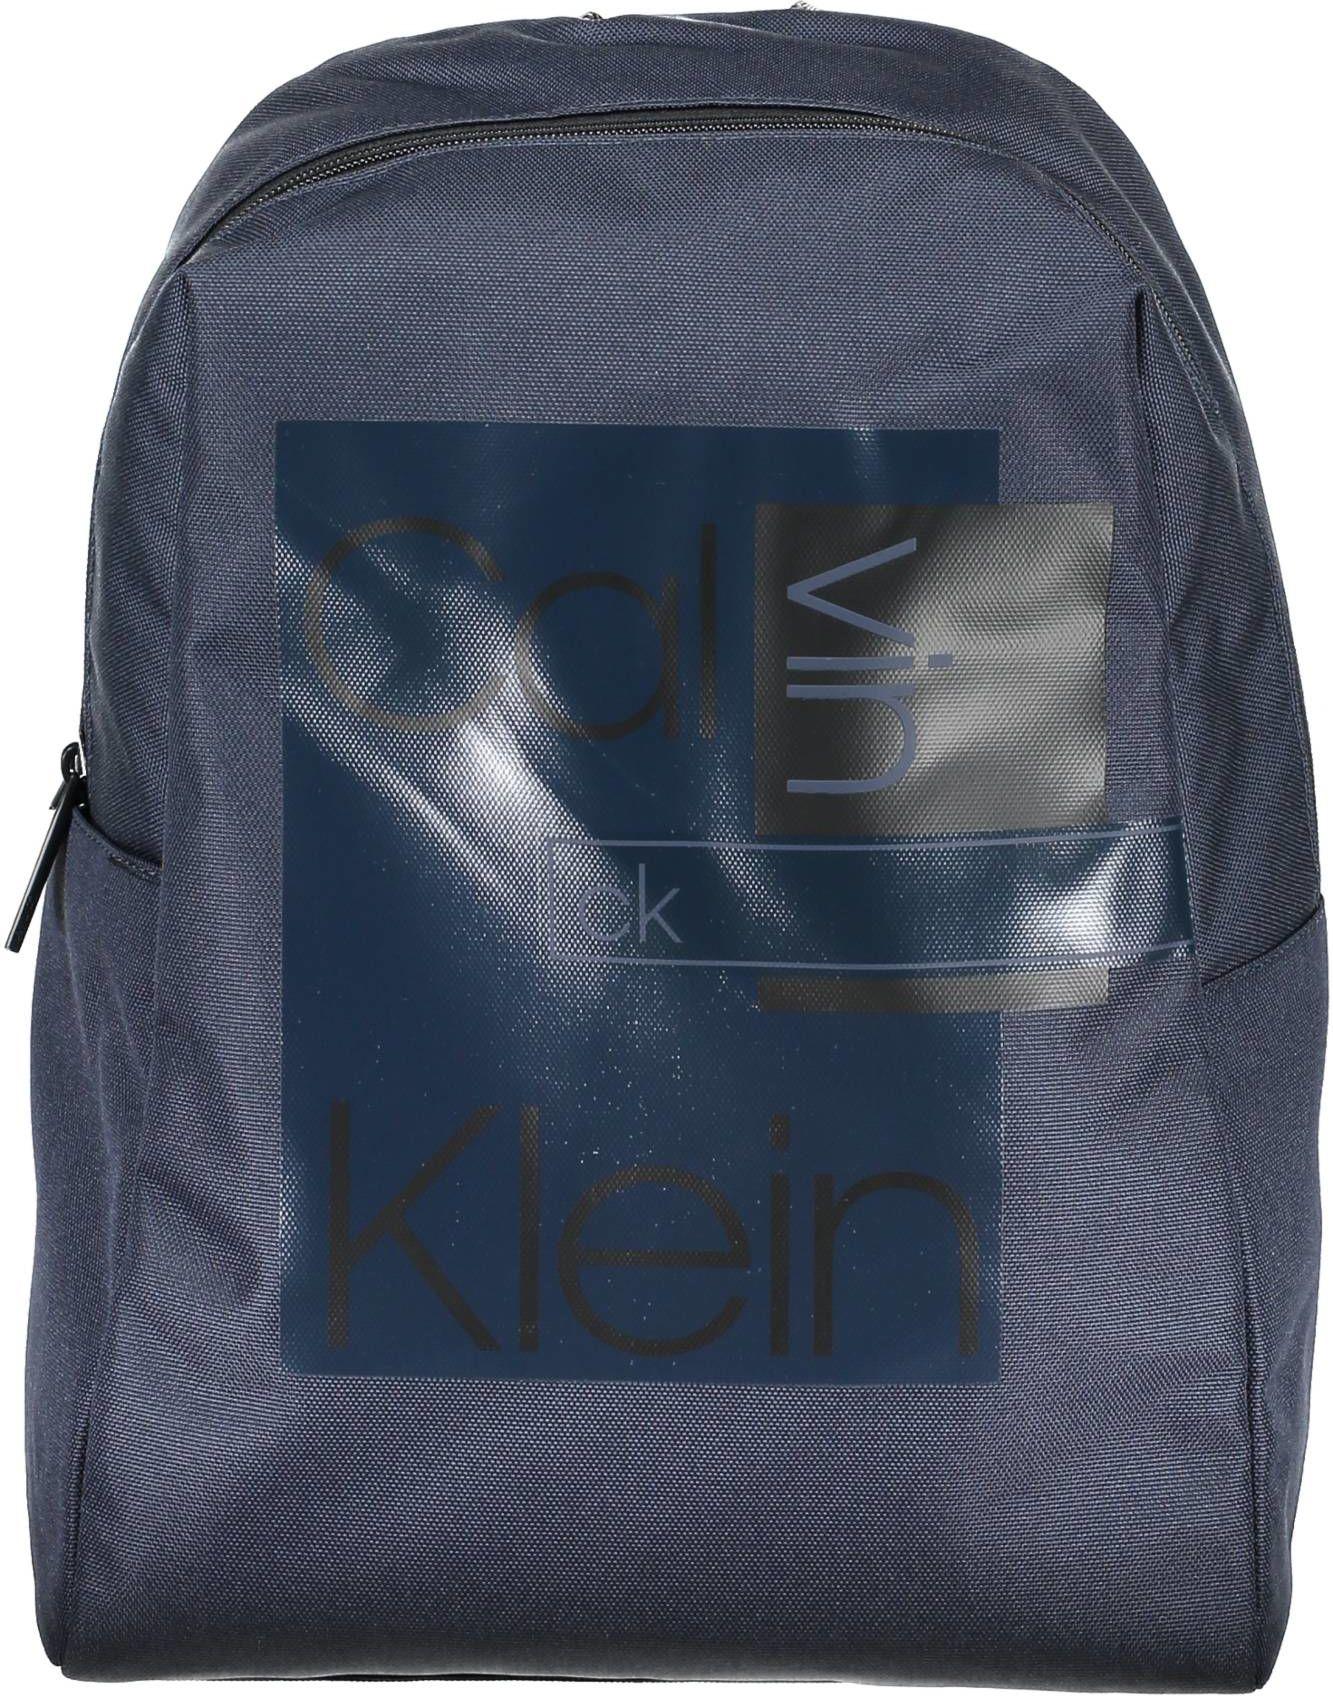 Plecak CALVIN KLEIN dla mężczyzn